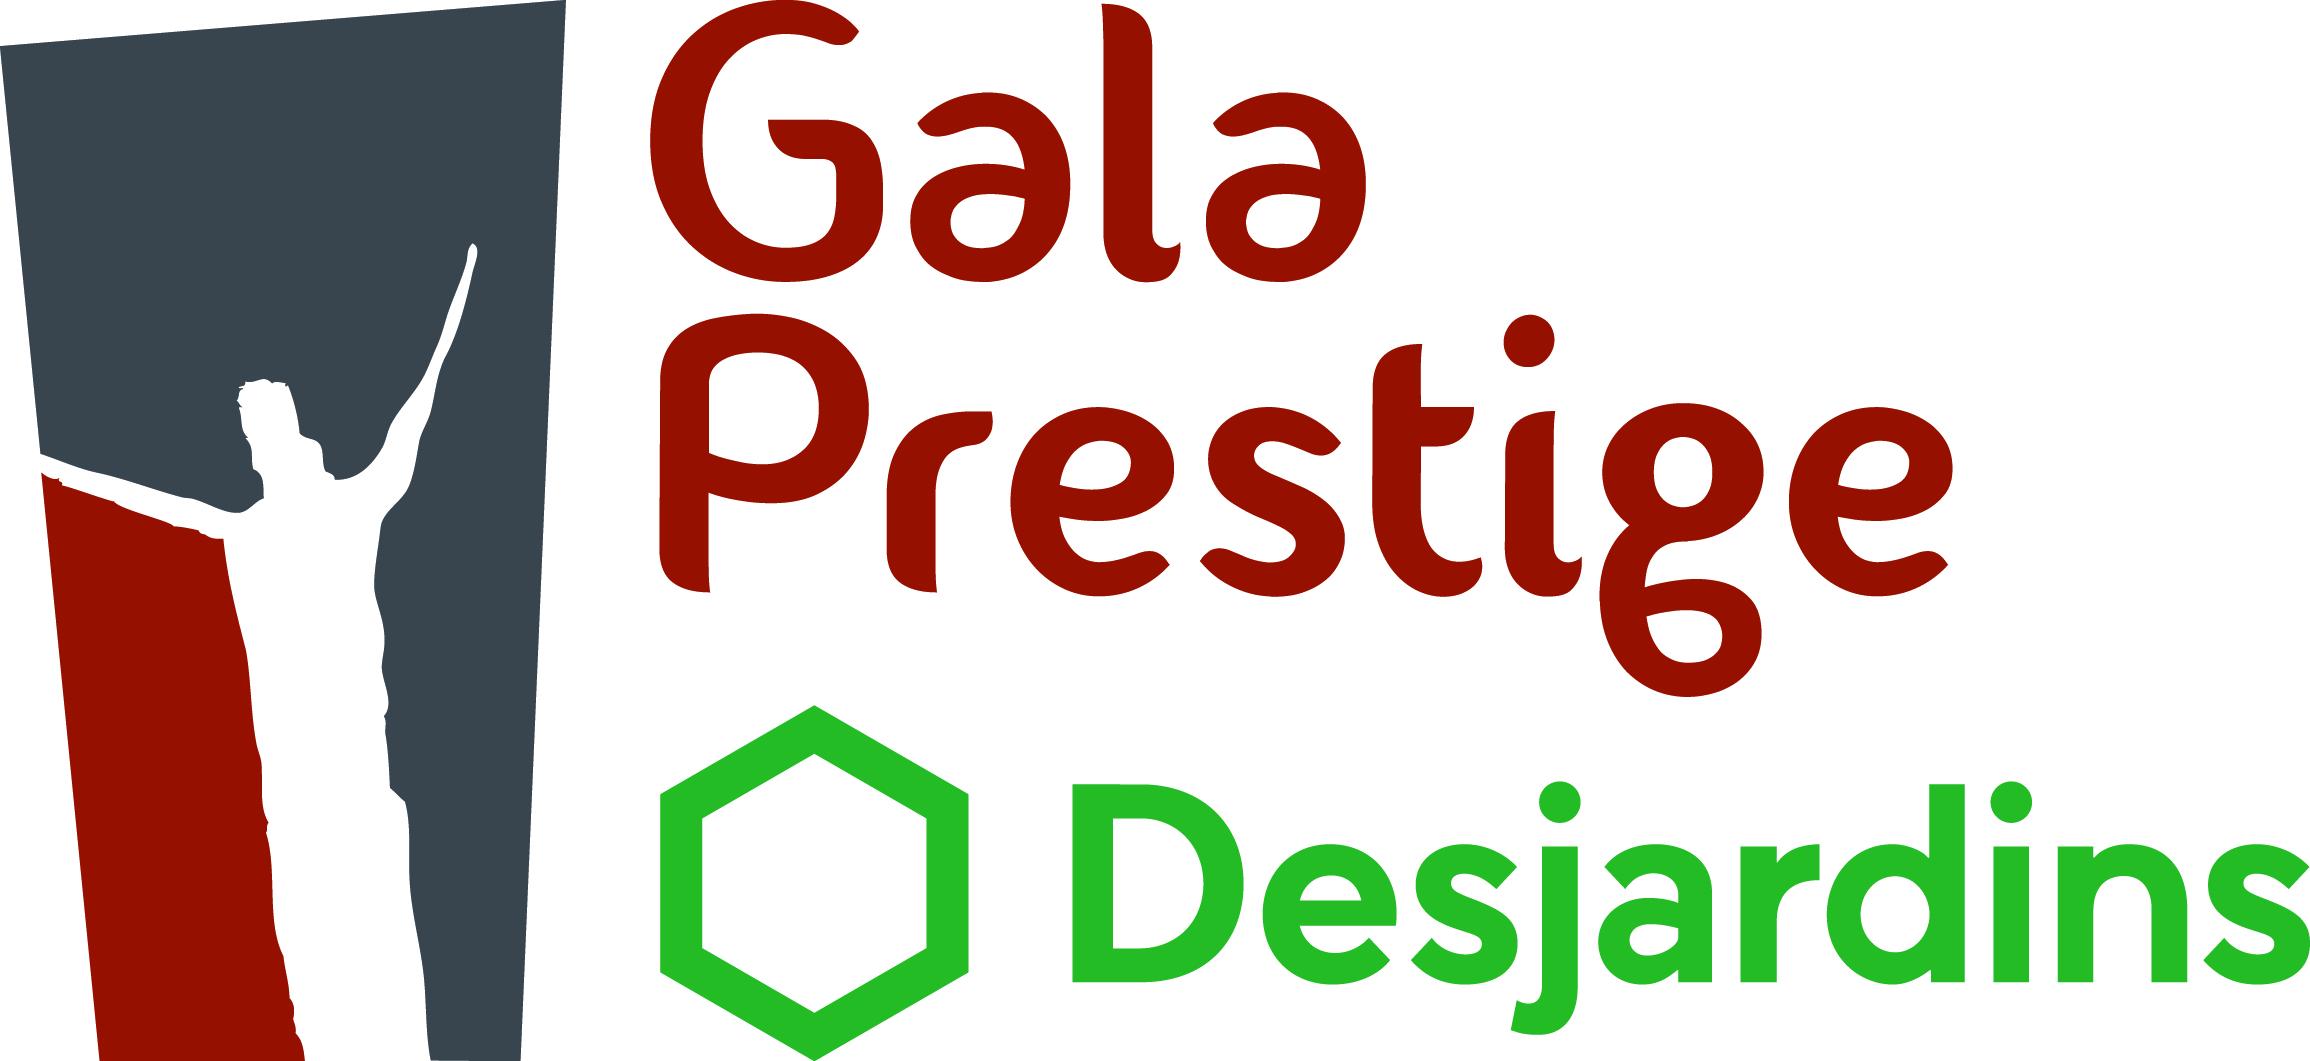 Gala Prestige Desjardins 2021